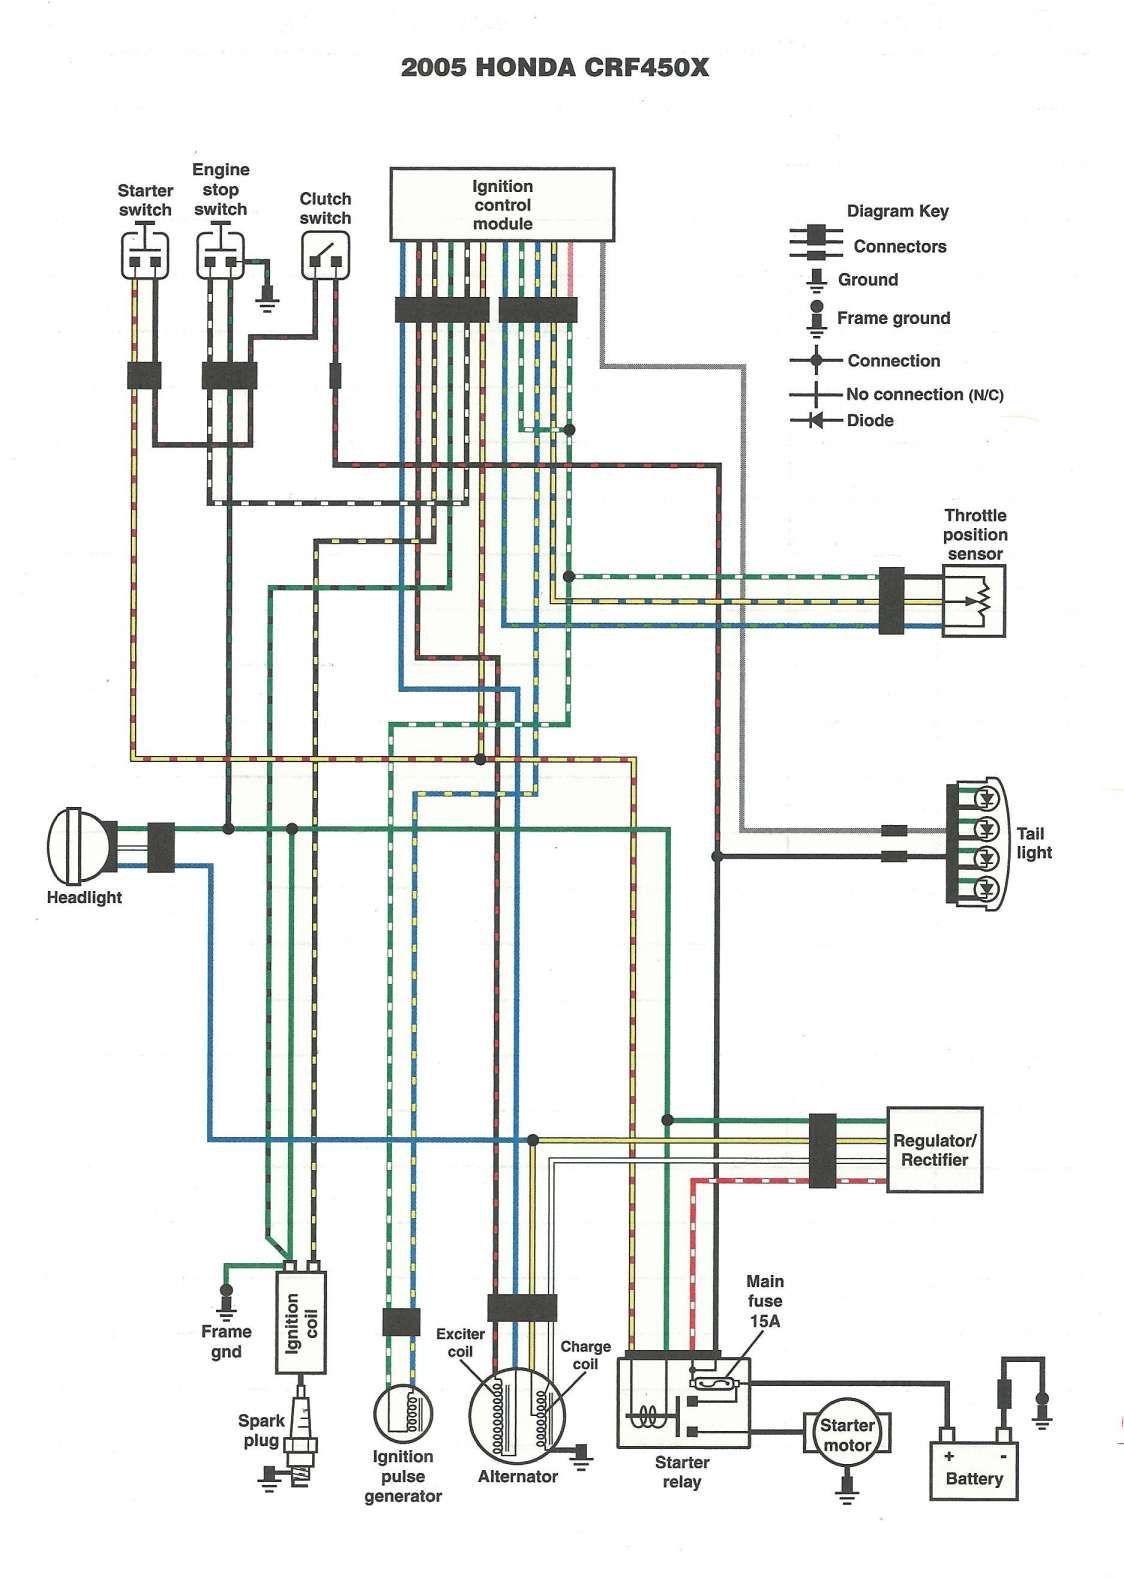 12 Motorcycle Circuit Diagram Motorcycle Wiring Electrical Wiring Diagram Honda Motorcycles